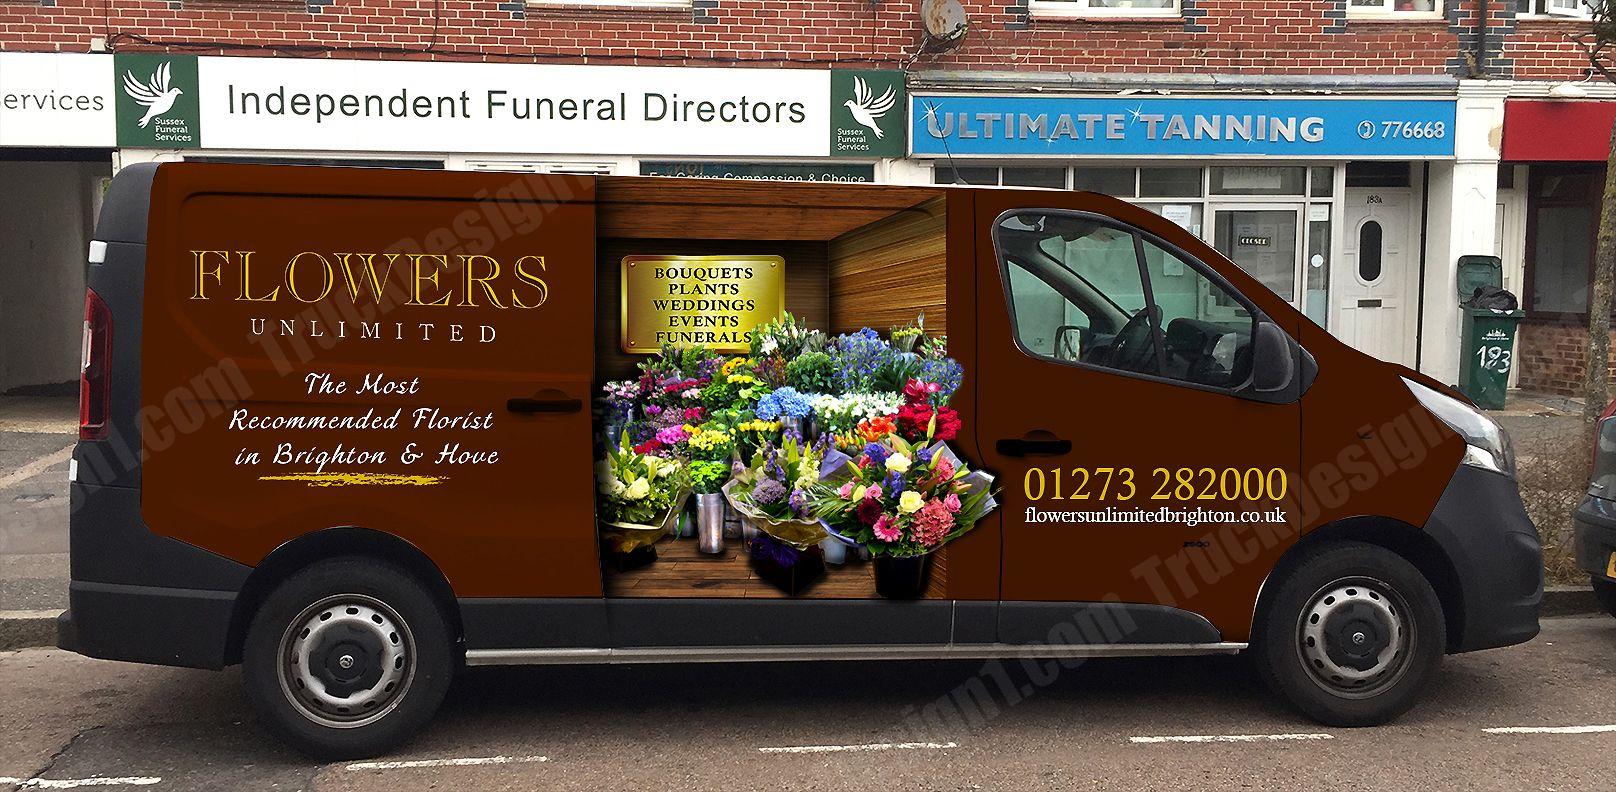 Flowers Unlimited Truck Design Car Wrap Vehicles